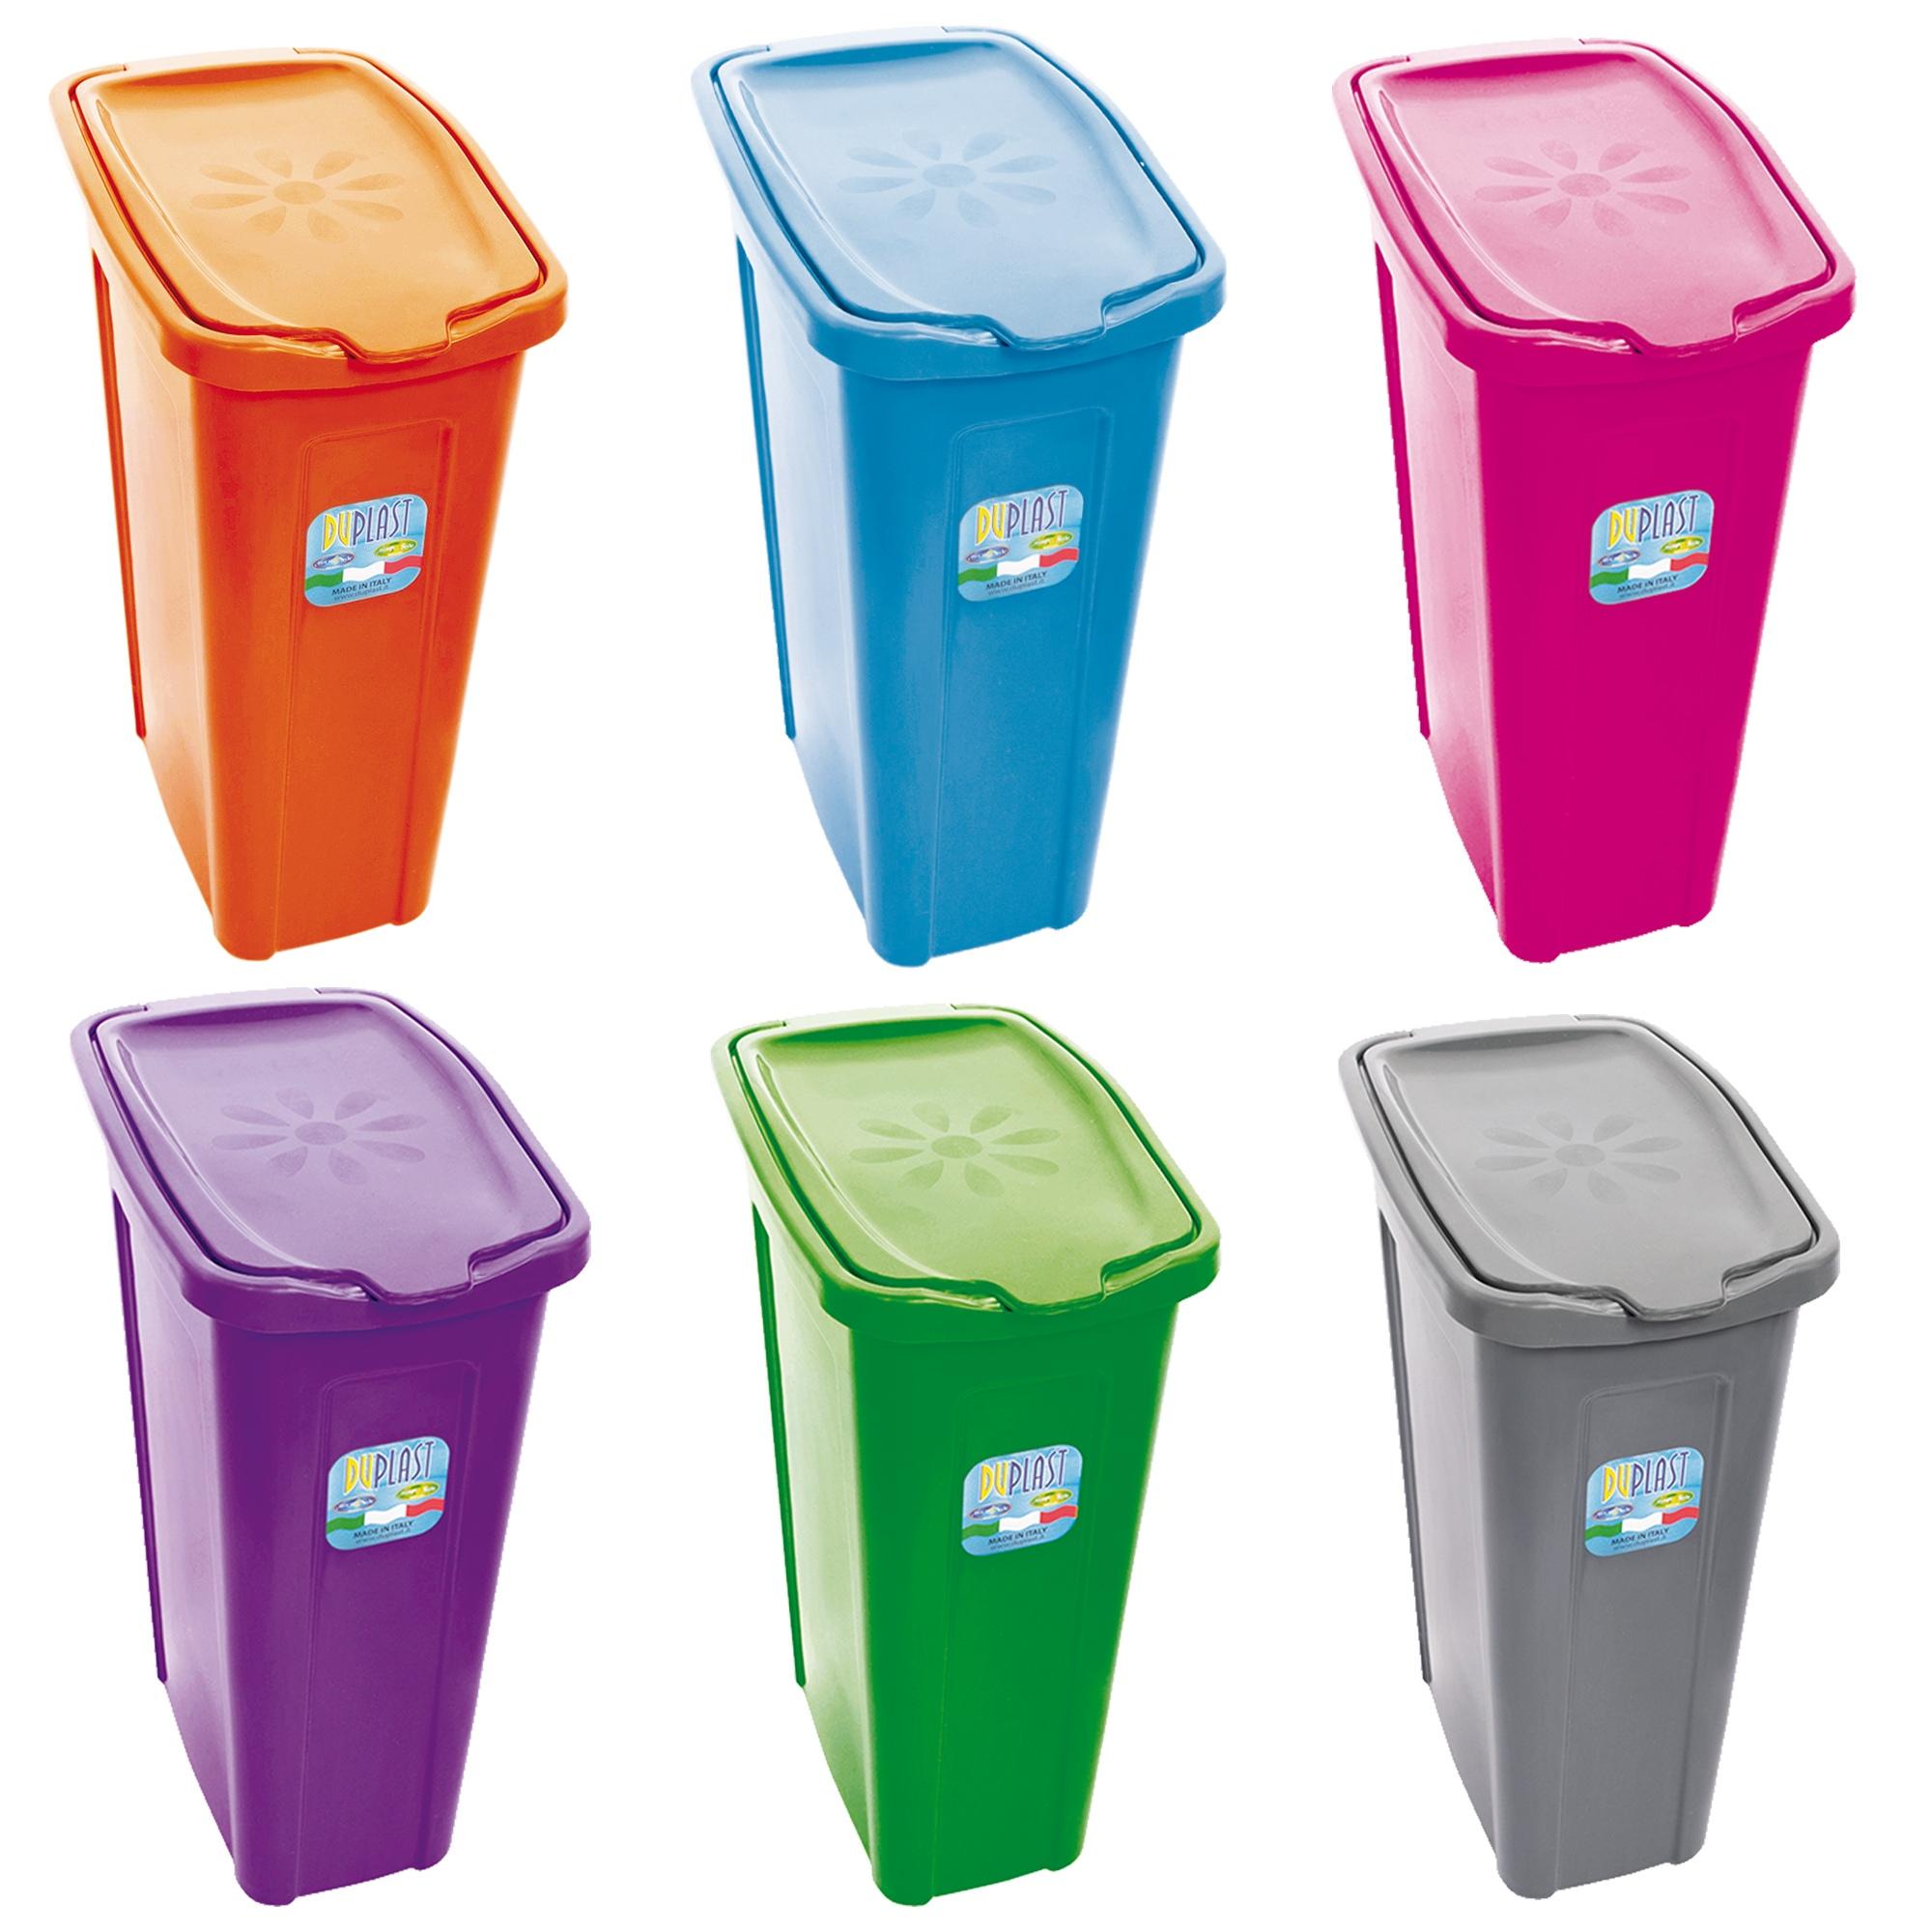 slim under cabinet dustbin rubbish waste 35 litre laundry. Black Bedroom Furniture Sets. Home Design Ideas